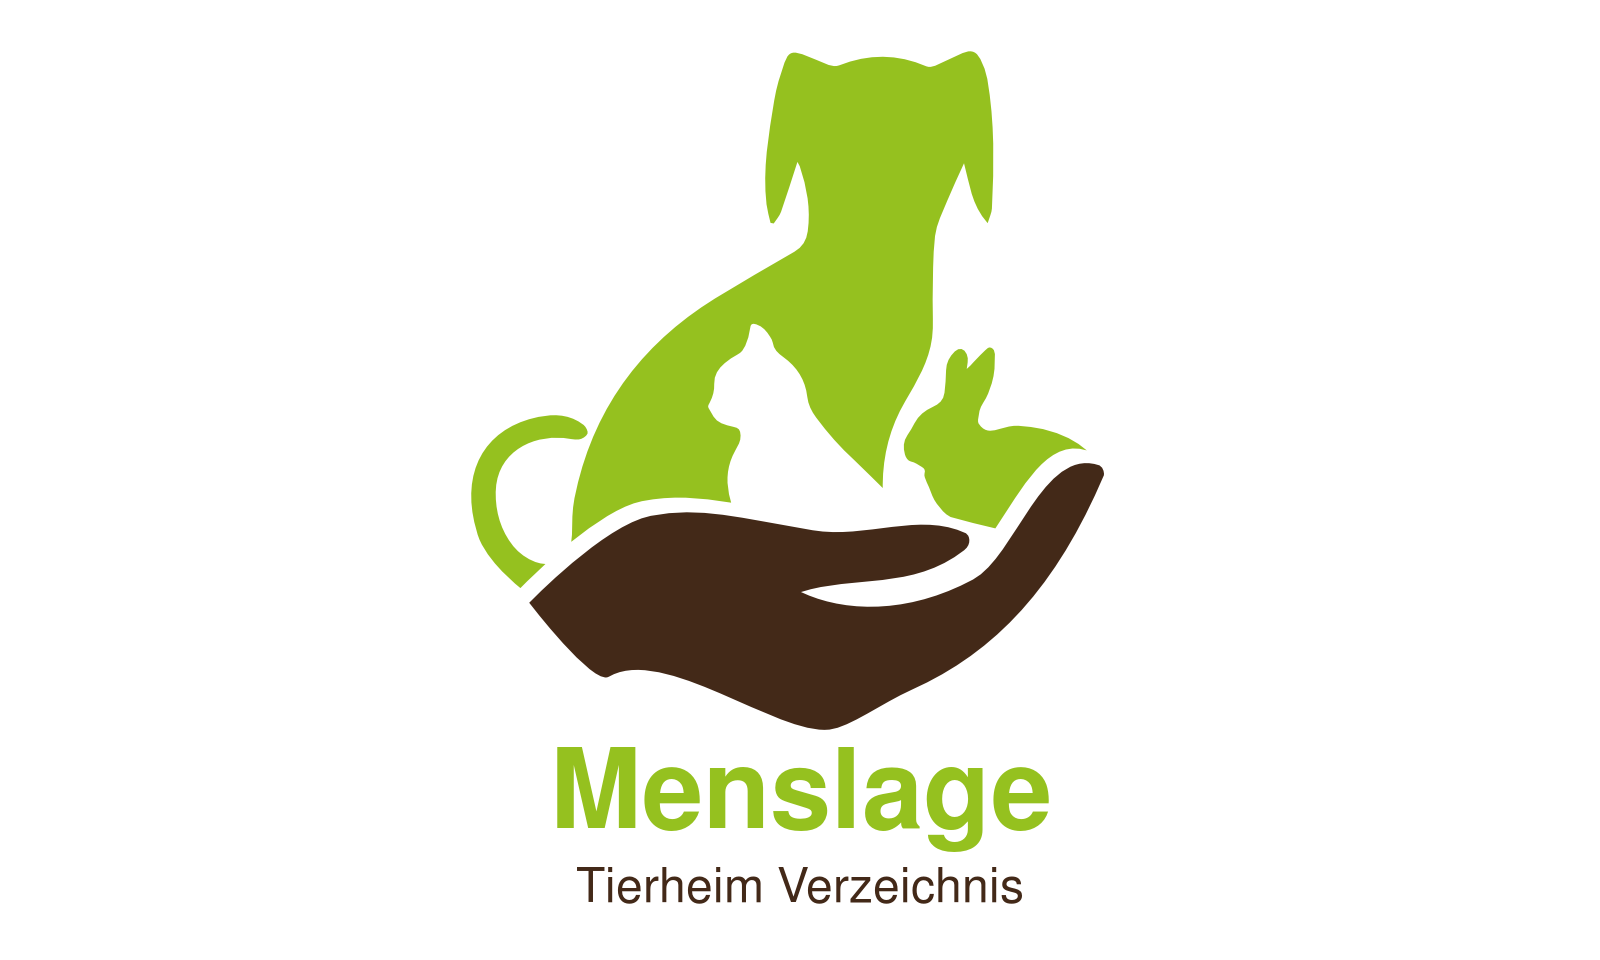 Tierheim Menslage